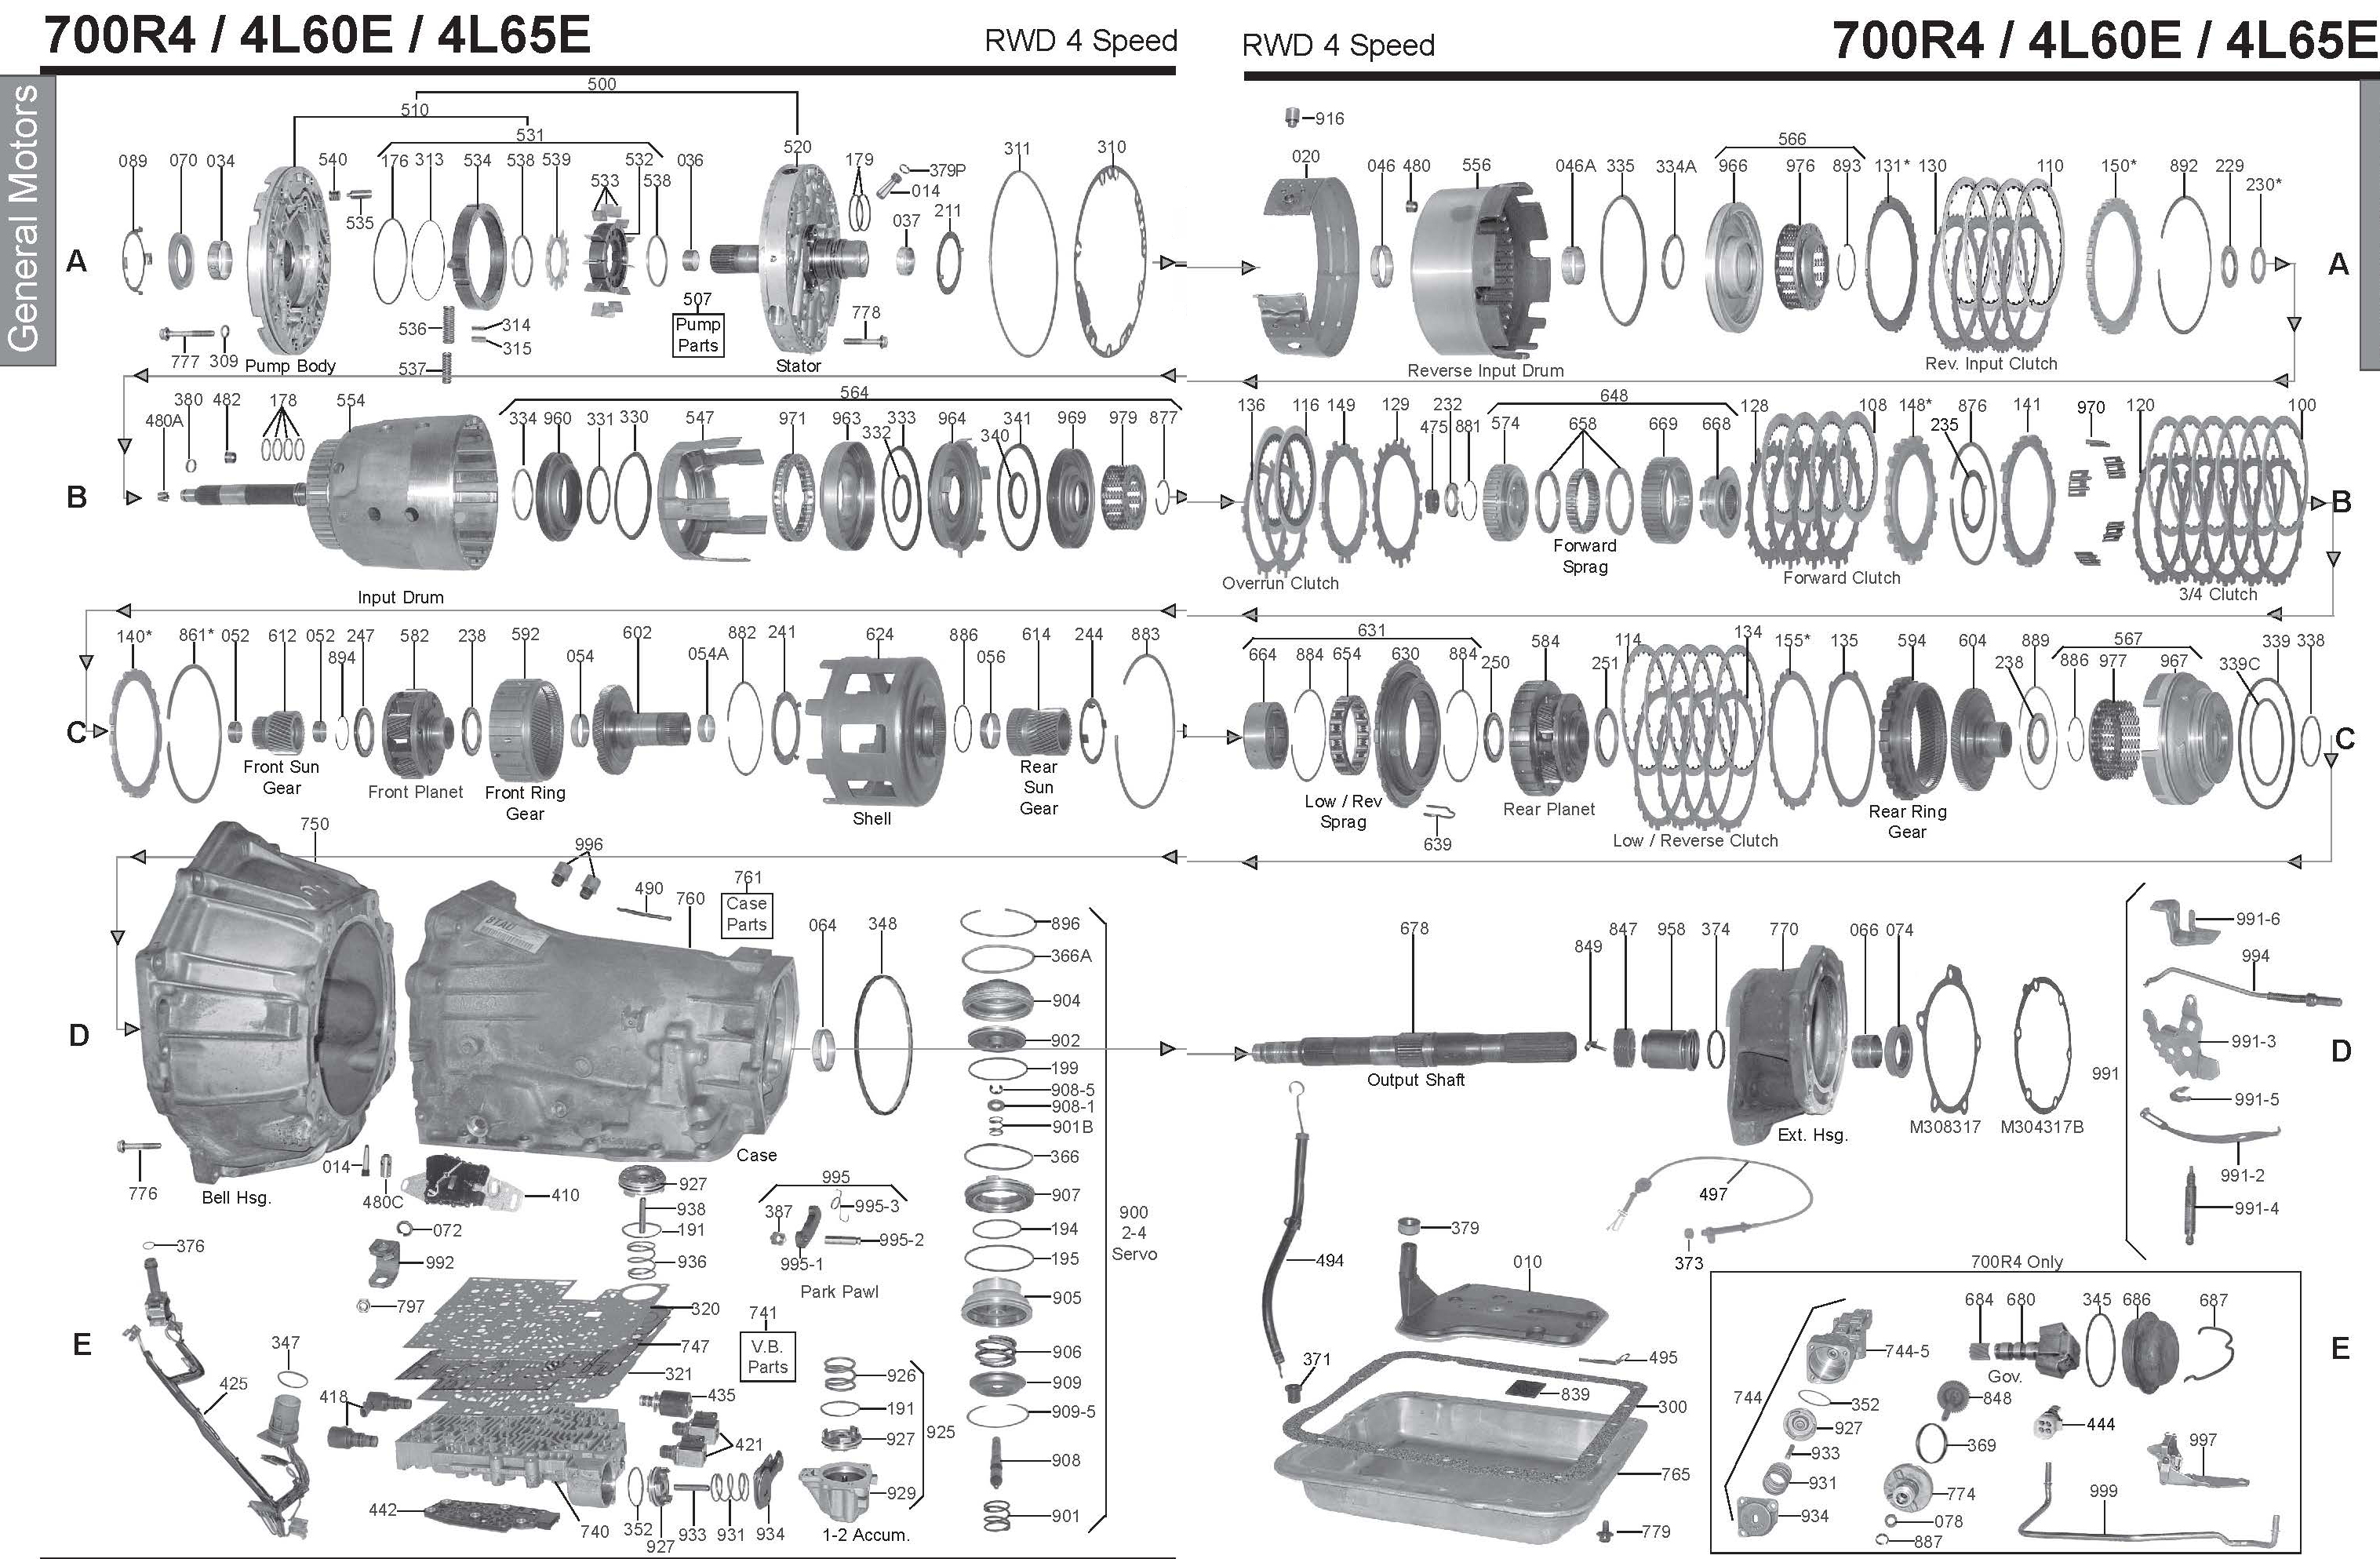 4l60e transmission wiring diagram e36 alternator 4t60e schematic get free image about